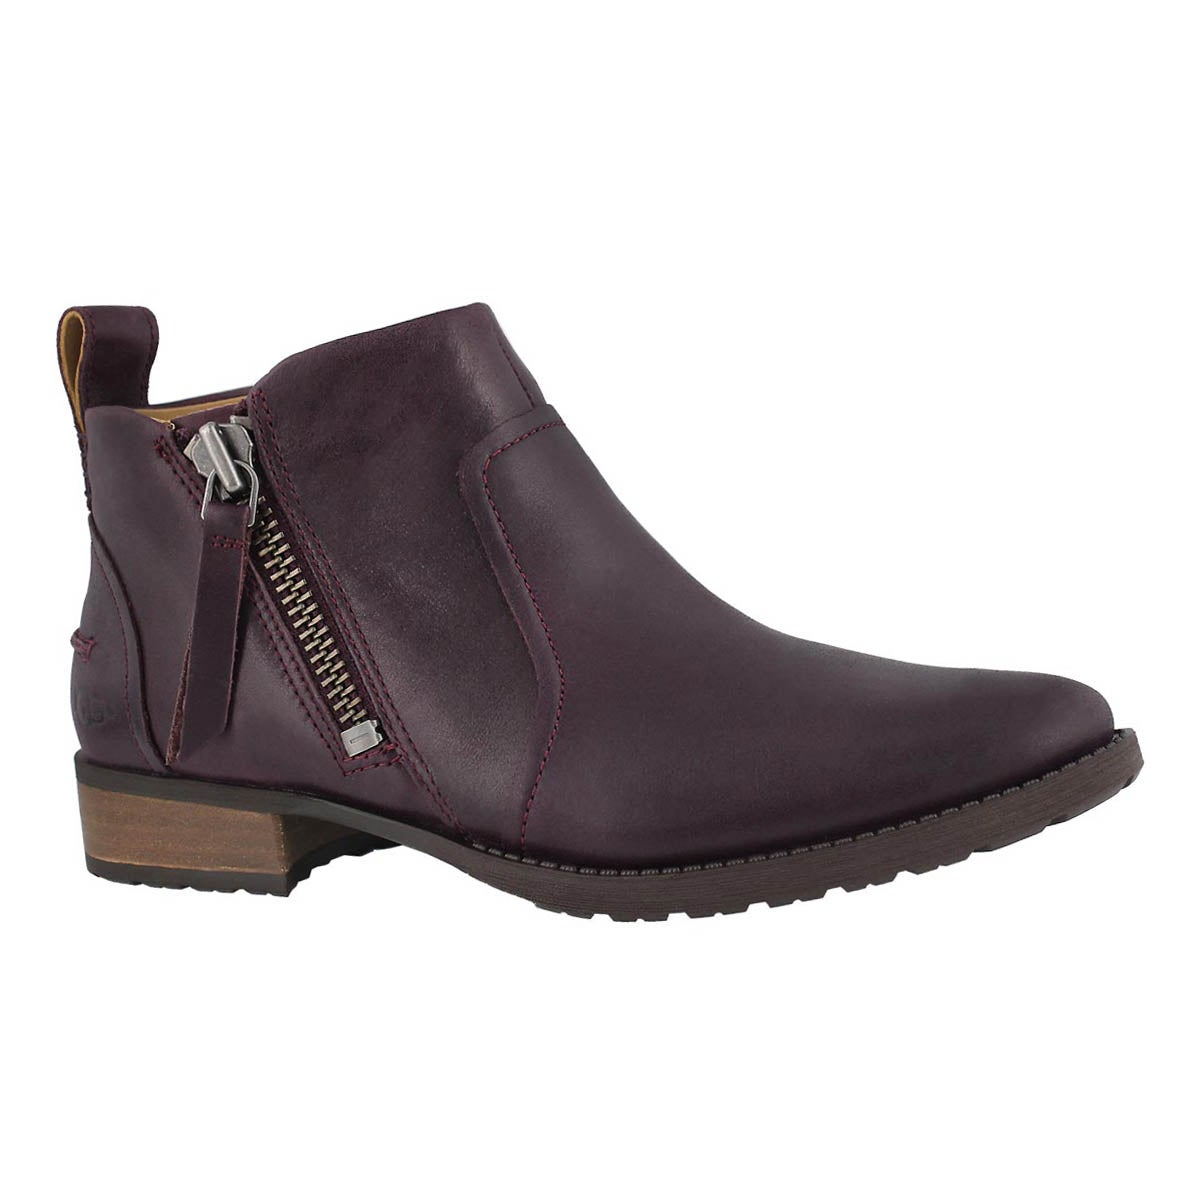 df109c04b19 Women's AUREO oxblood leather side zip bootie